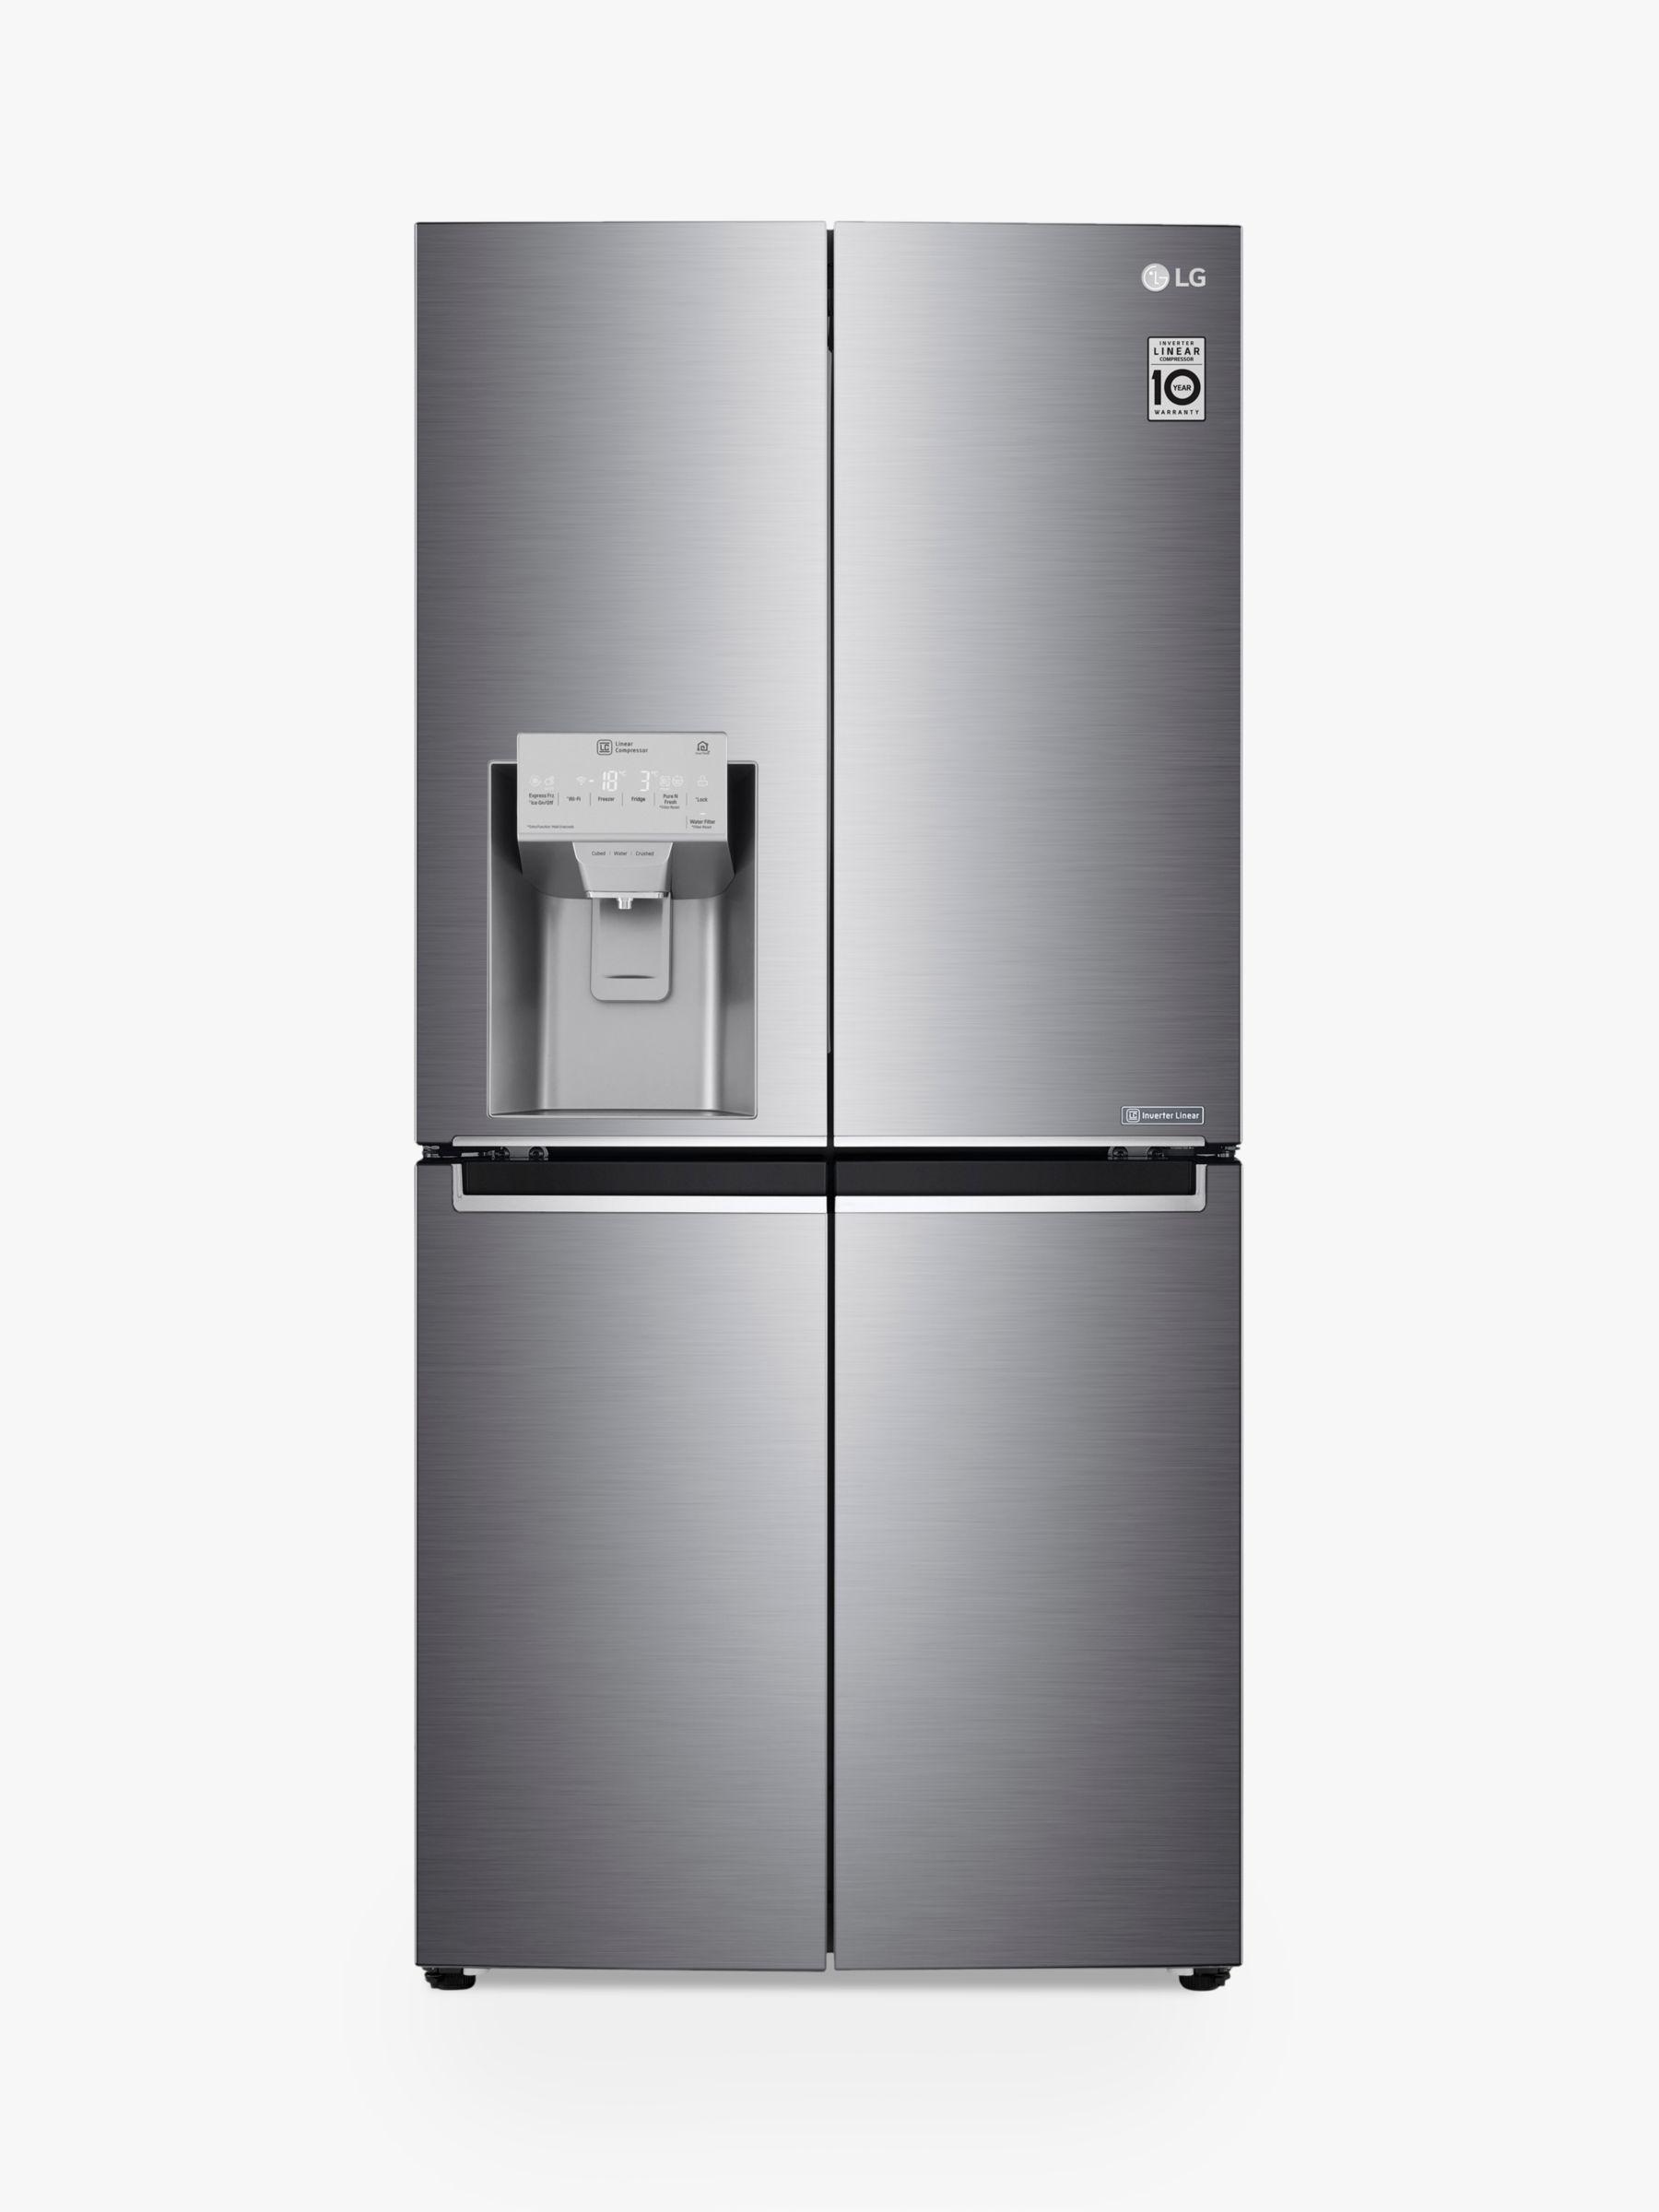 LG LG GML844PZKV American Style Fridge Freezer, A+ Energy Rating, 83.5cm Wide, Shiny Steel